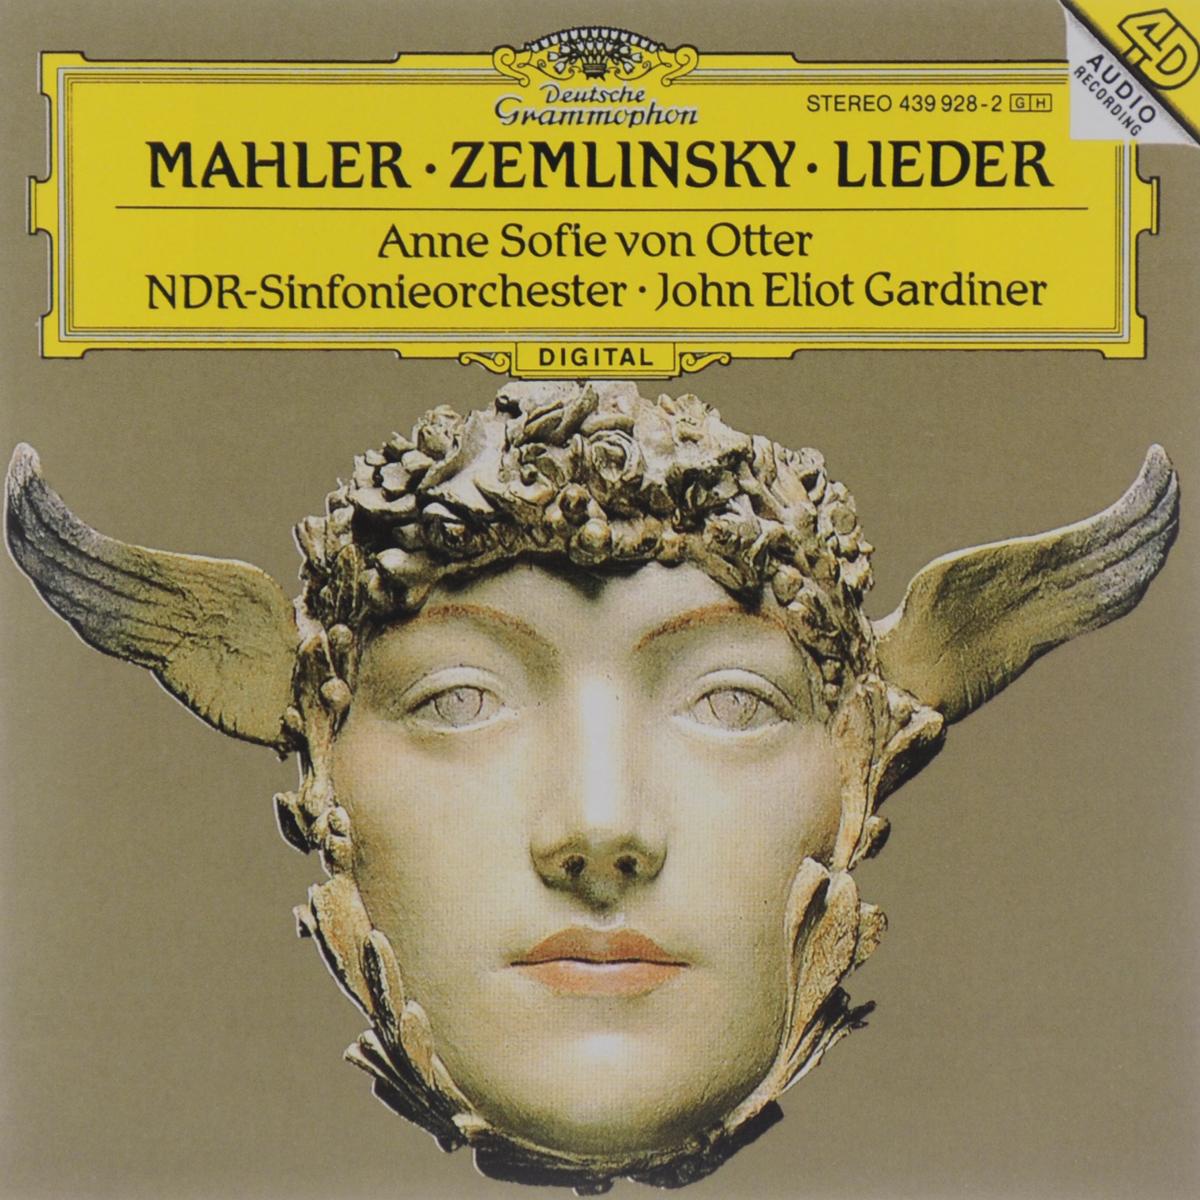 Анн Софи фон Оттер,NDR-Sinfonieorchester Hamburg,Джон Элиот Гардинер Anne Sofie Von Otter. Mahler / Zemlinsky. Lieder цена и фото